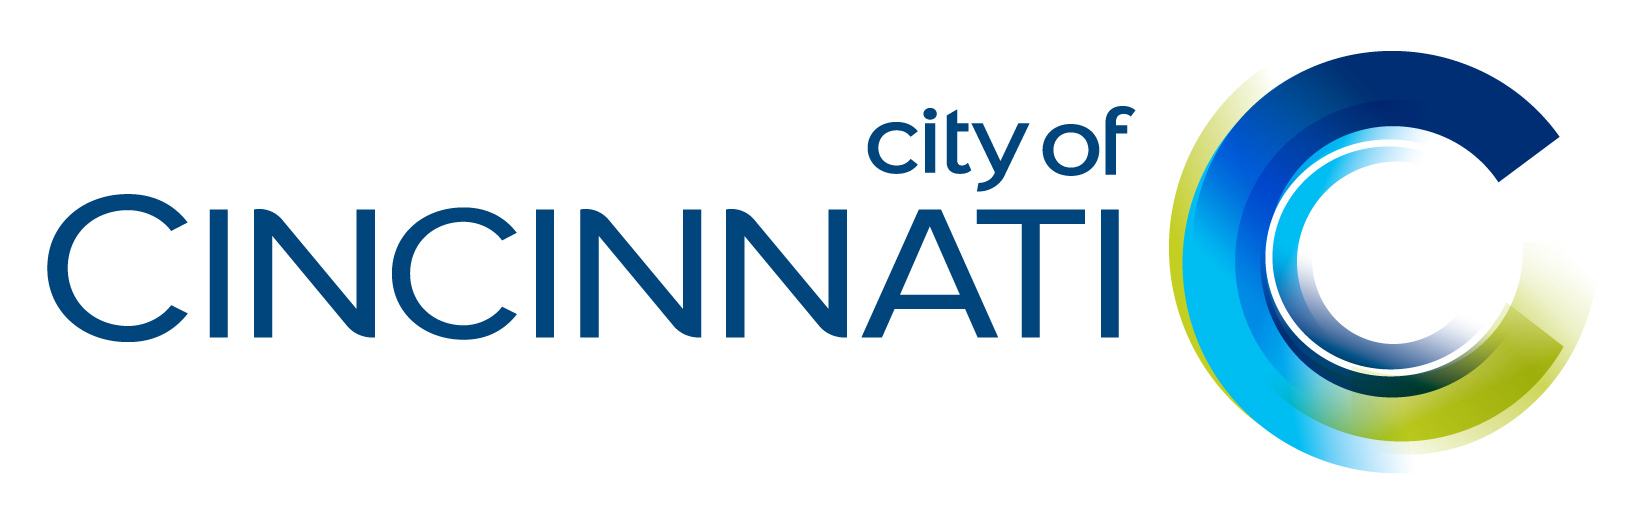 cincinnati city logo.jpg